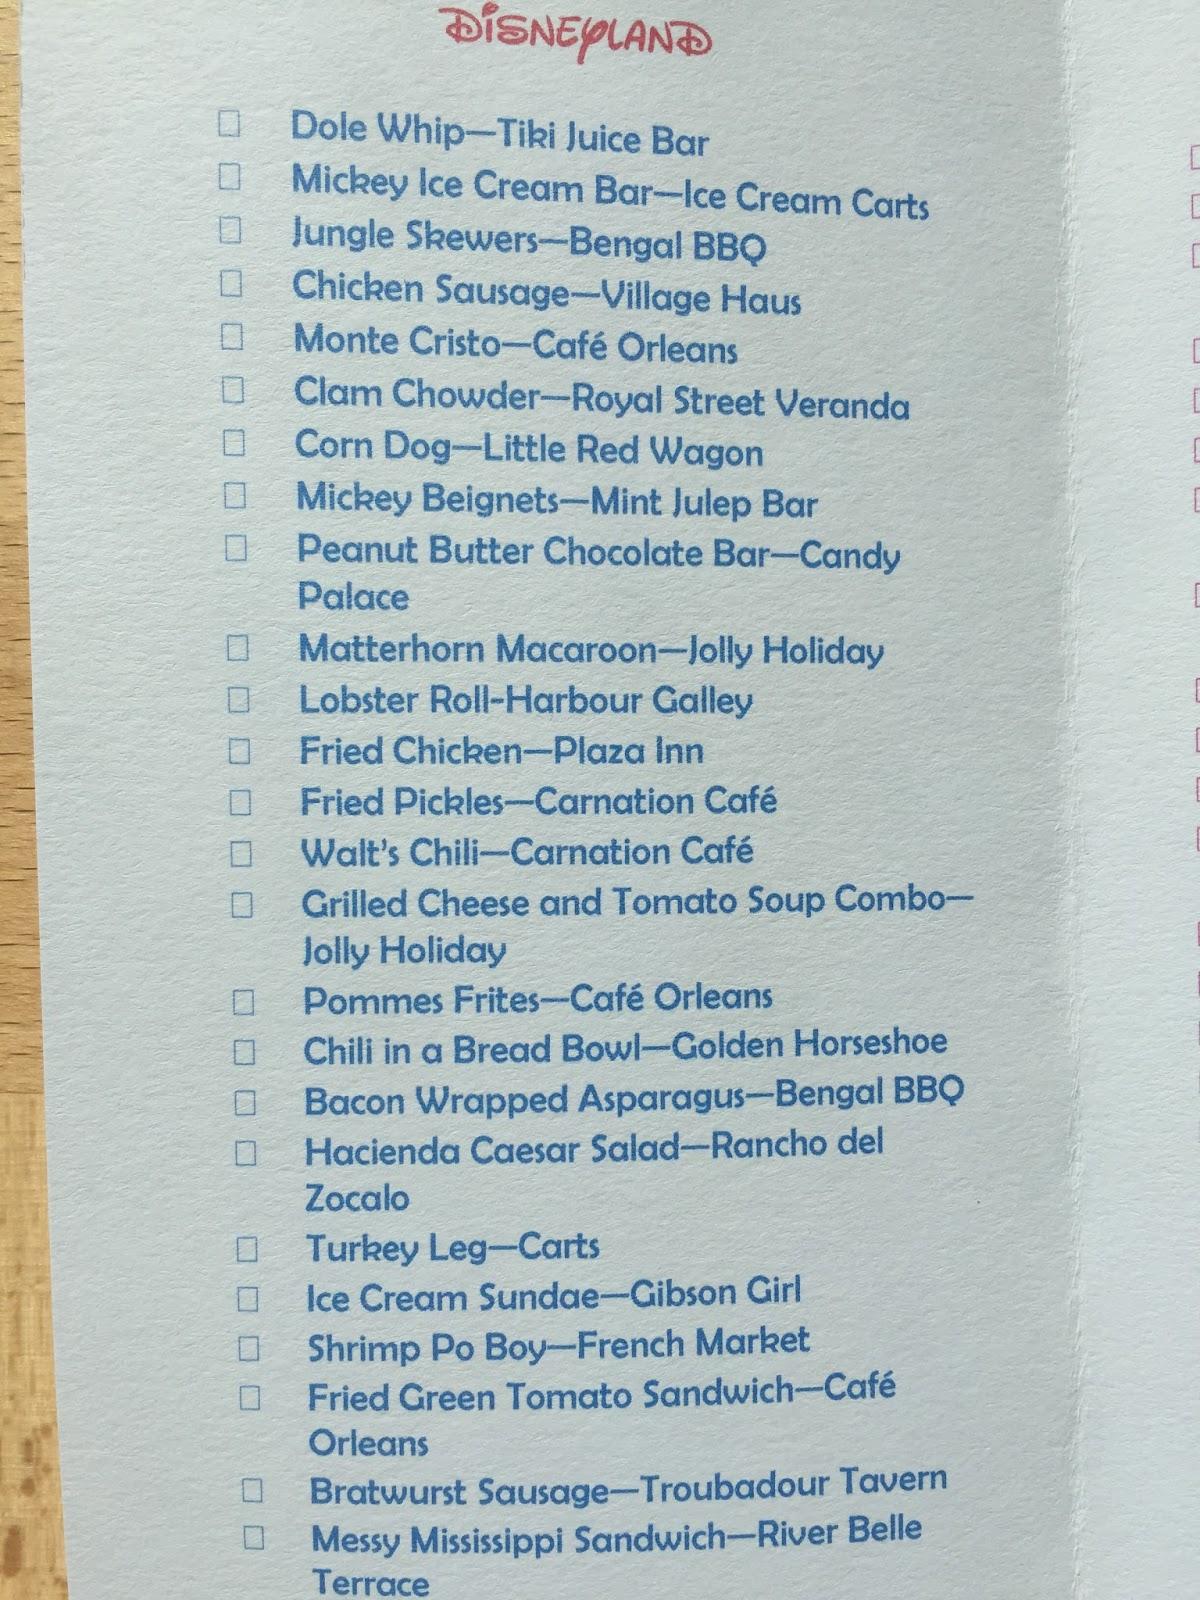 Disneyland Food and Drink Checklist - Falon Loves Life